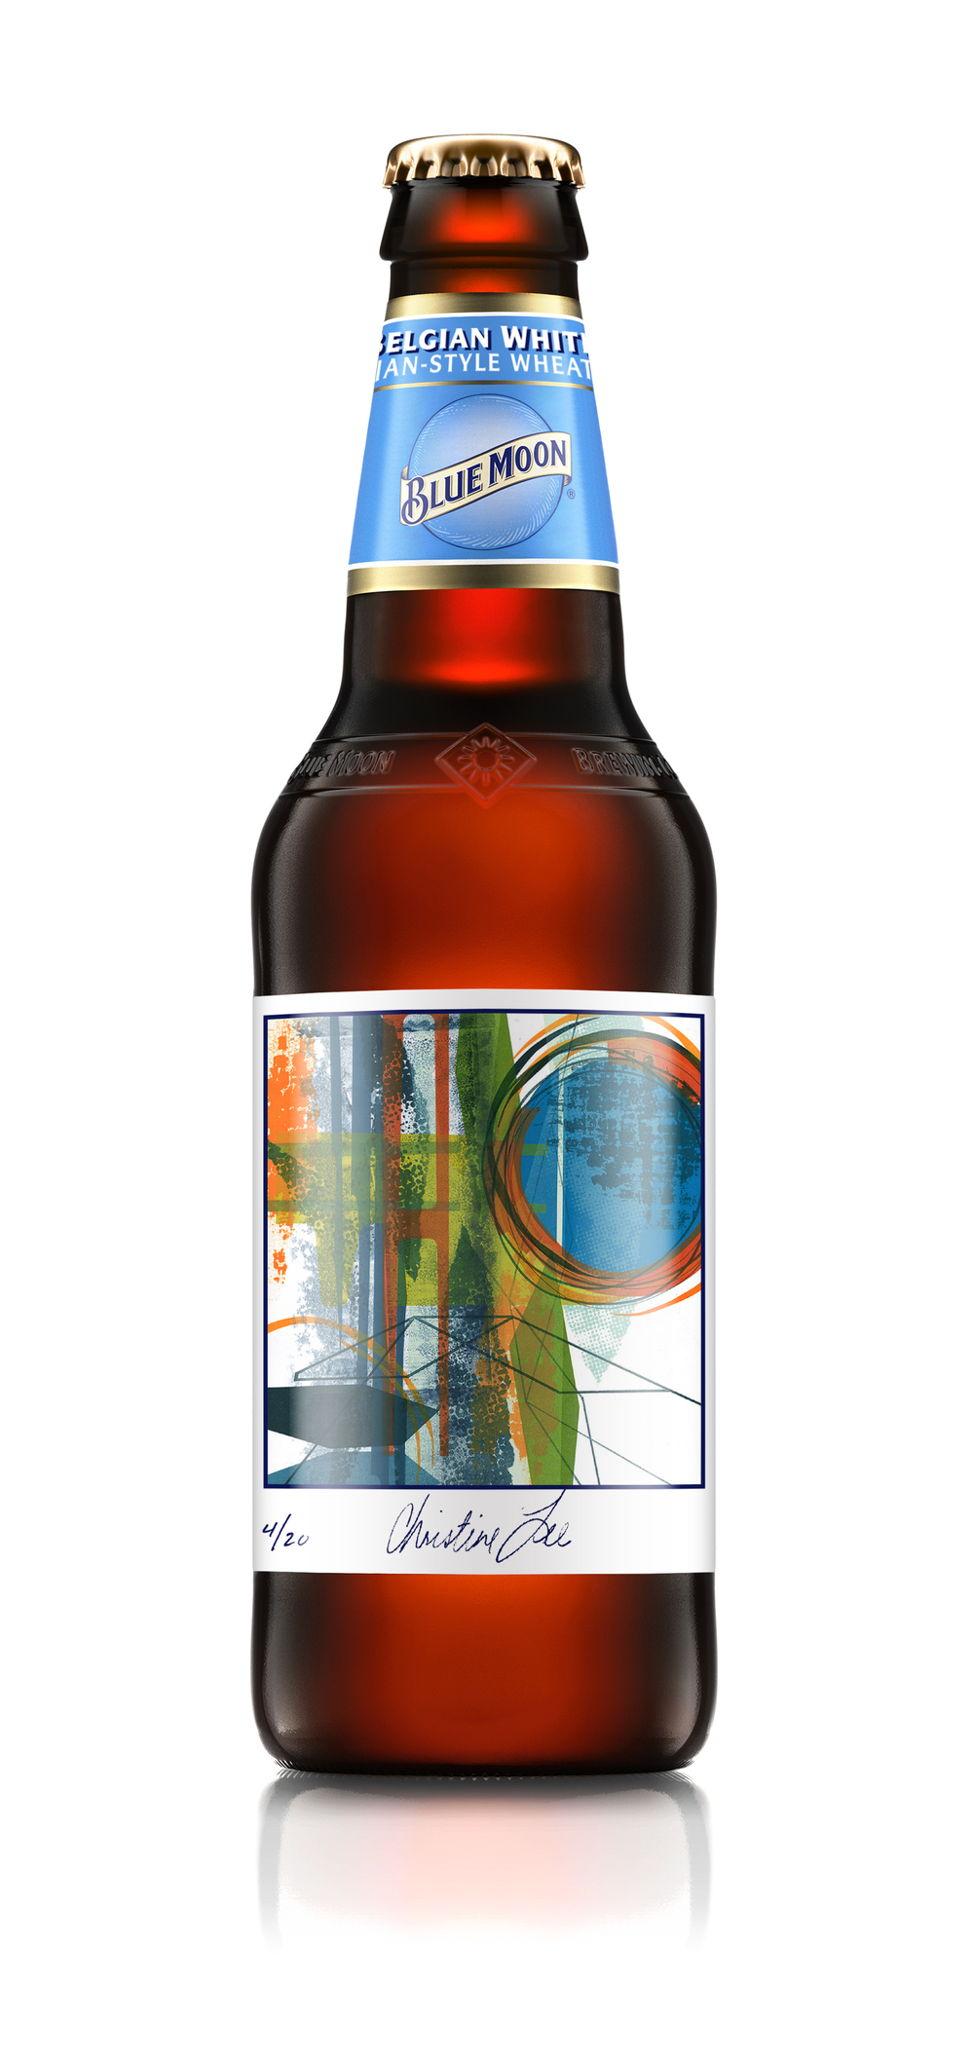 BMO-195A_Bottle_12z_Render_ChristineLee_150401_FJ.jpg